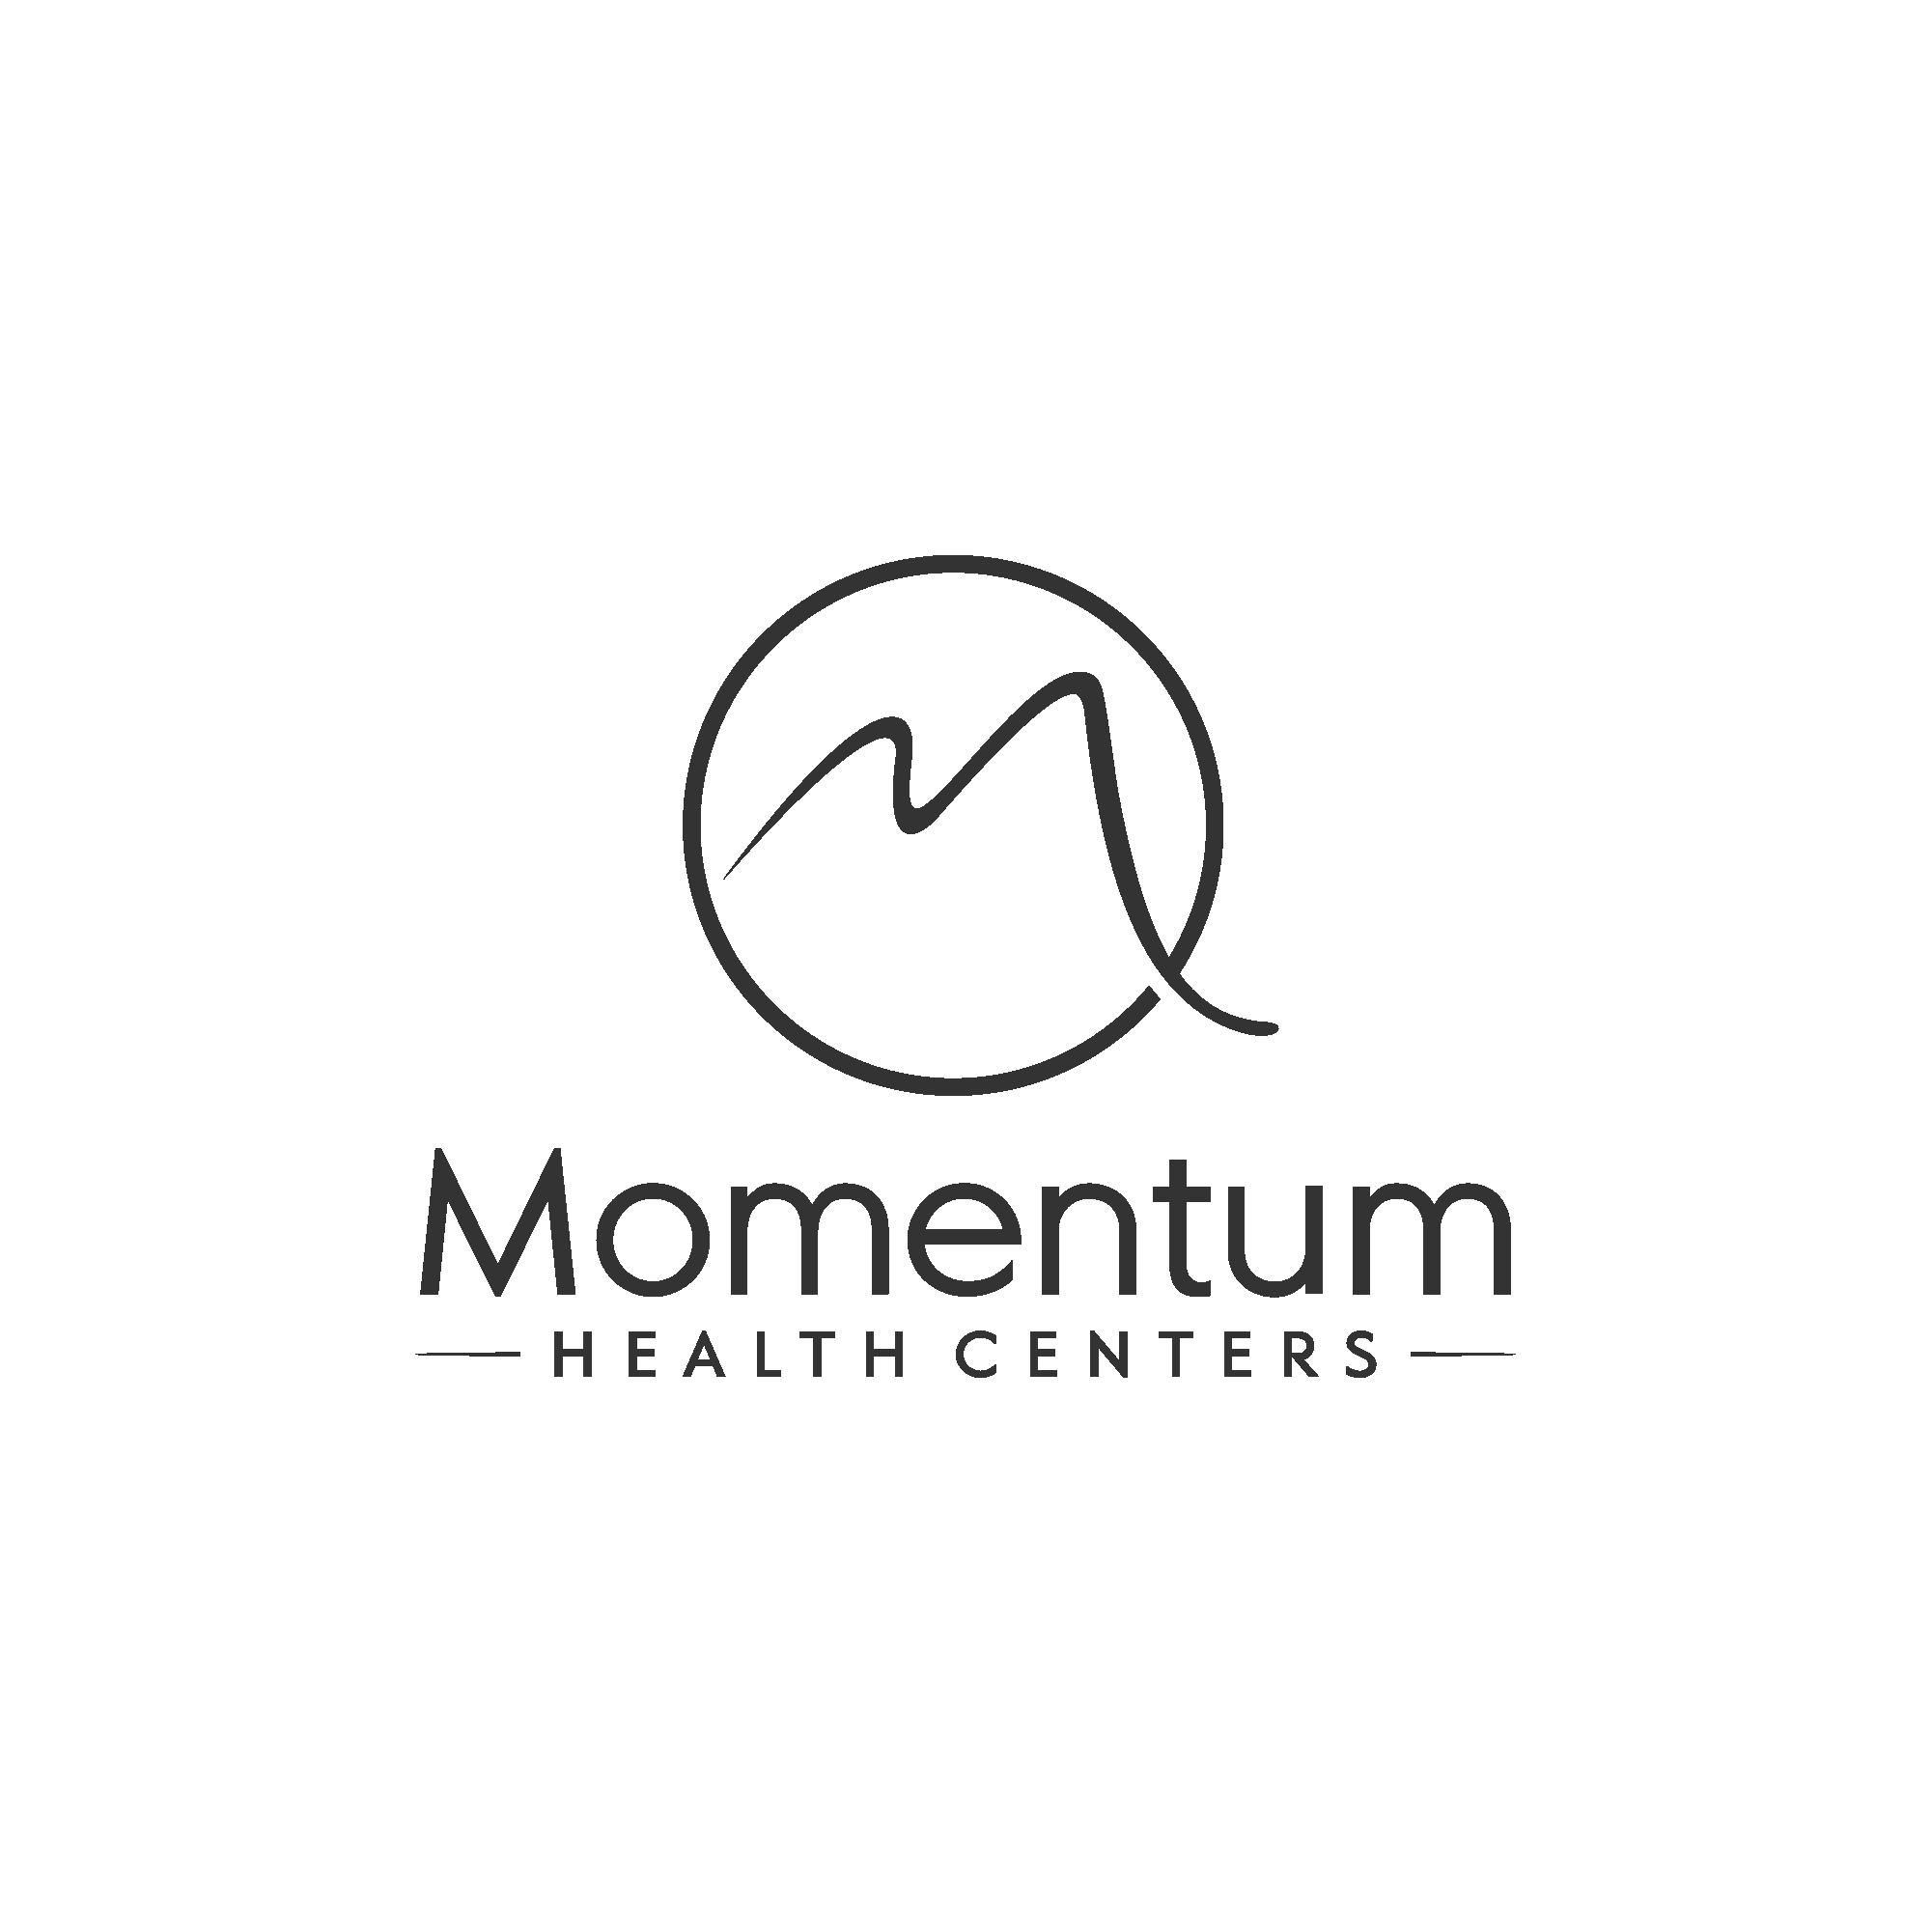 Momentum Health Centers Logo